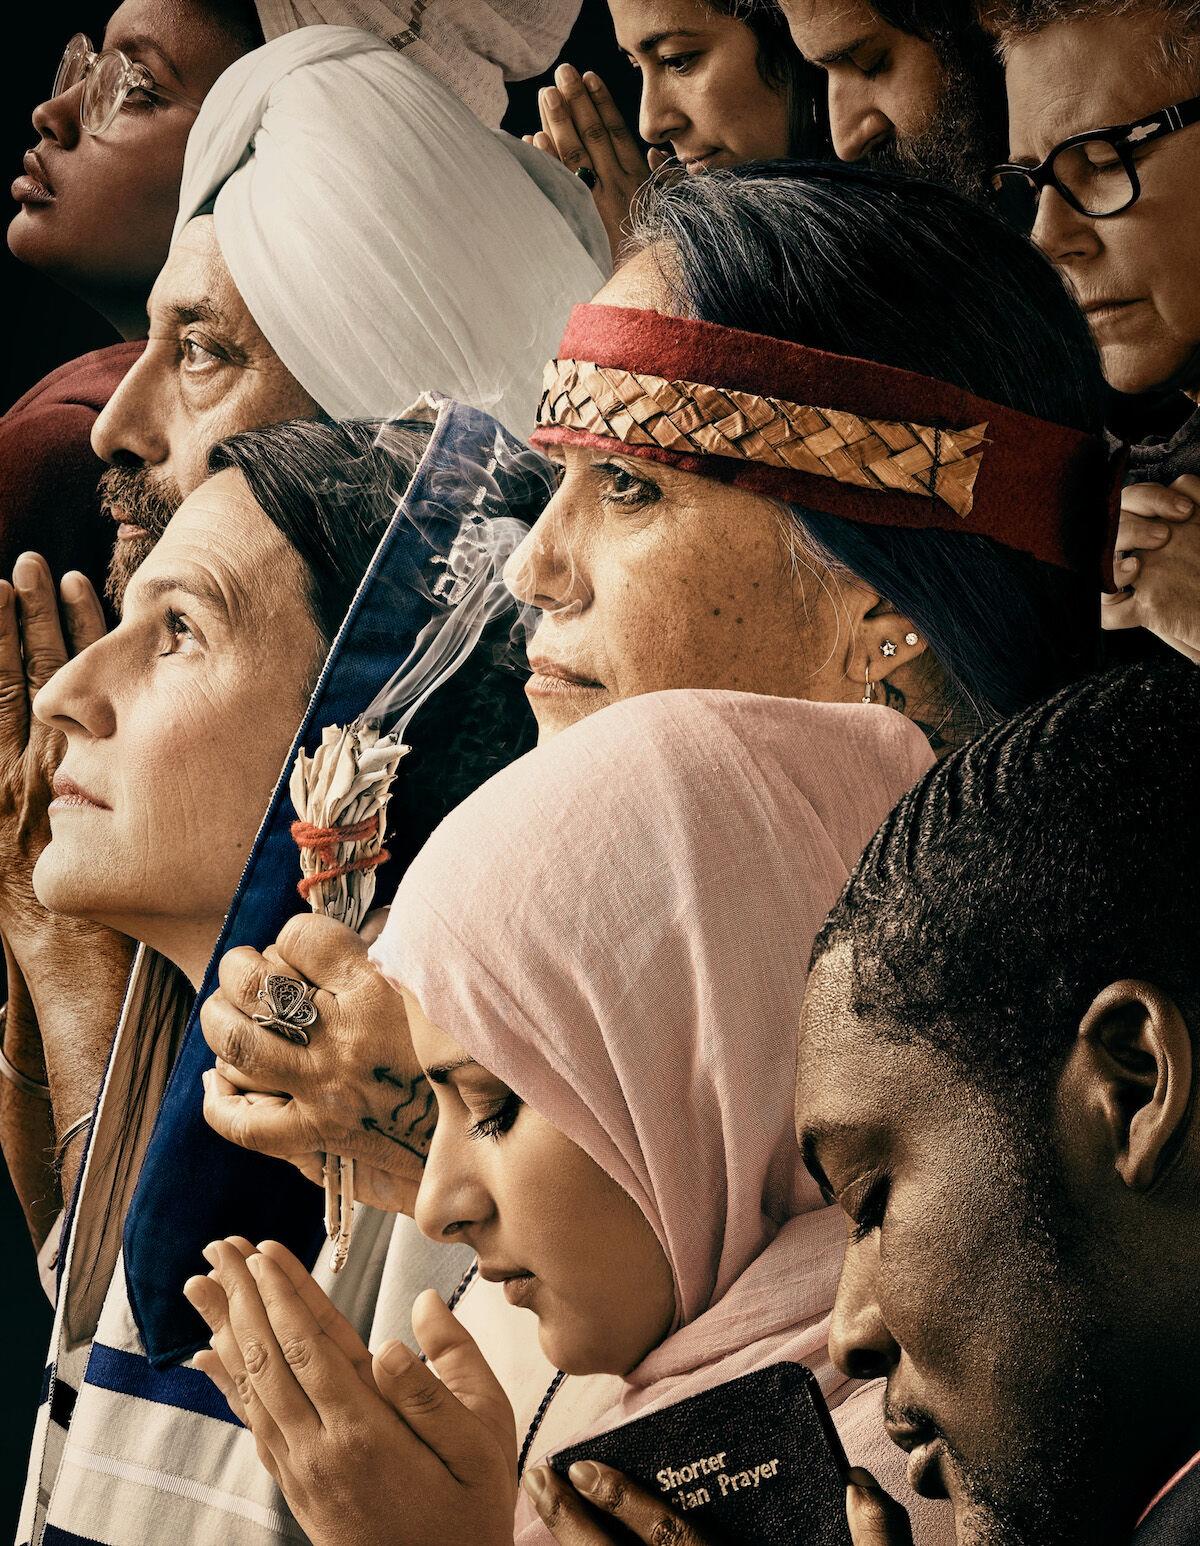 Interpretation of Norman Rockwell's Freedom of Worship by For Freedoms, featuring Rev. Edward Anderson, Maryam Nouh, Lydia Ponce, Rabbi Sharon Brous, Gurdev Kohli, Miehrit Kassa, Greta Ronningen, Amir Yakira, Claudia Pena.